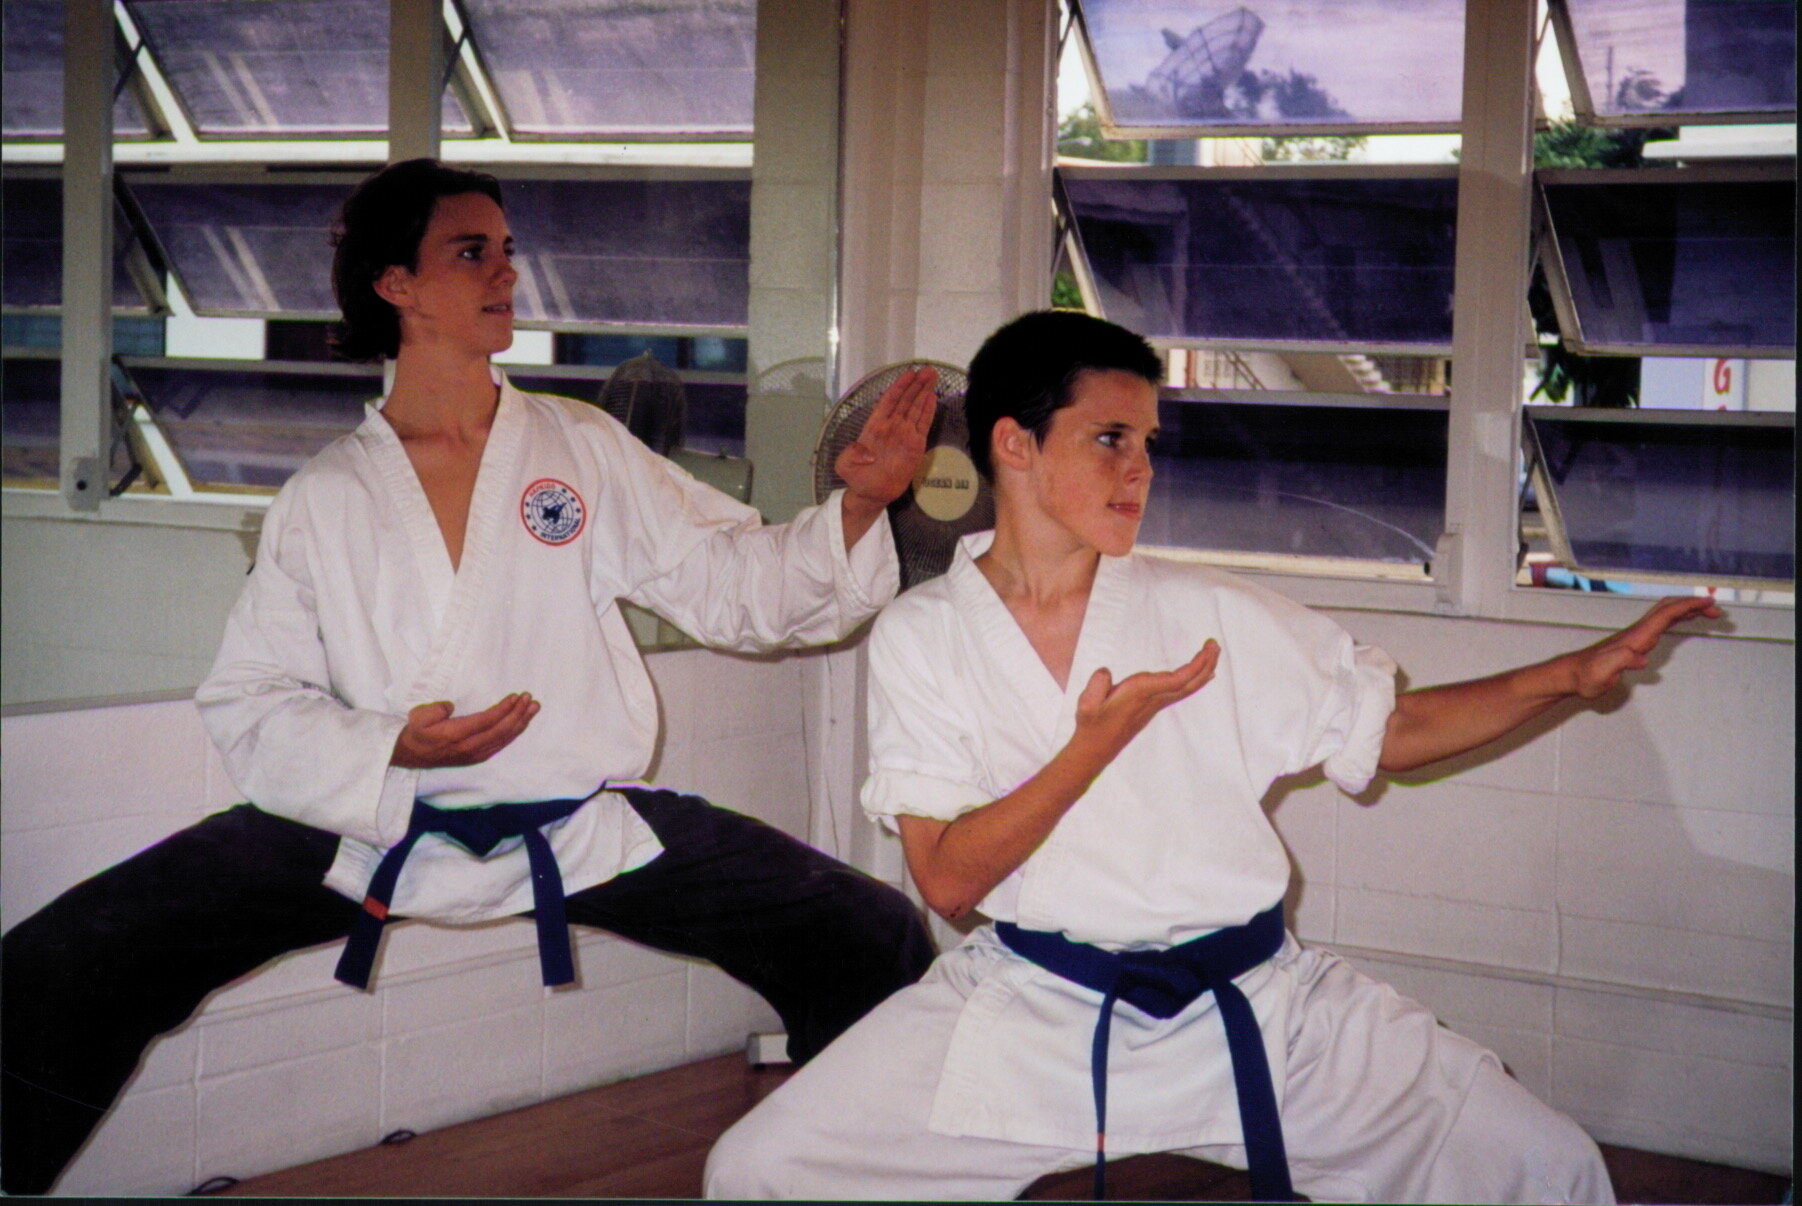 Austin & Garret in the Honolulu Dojo. Circa 1997.